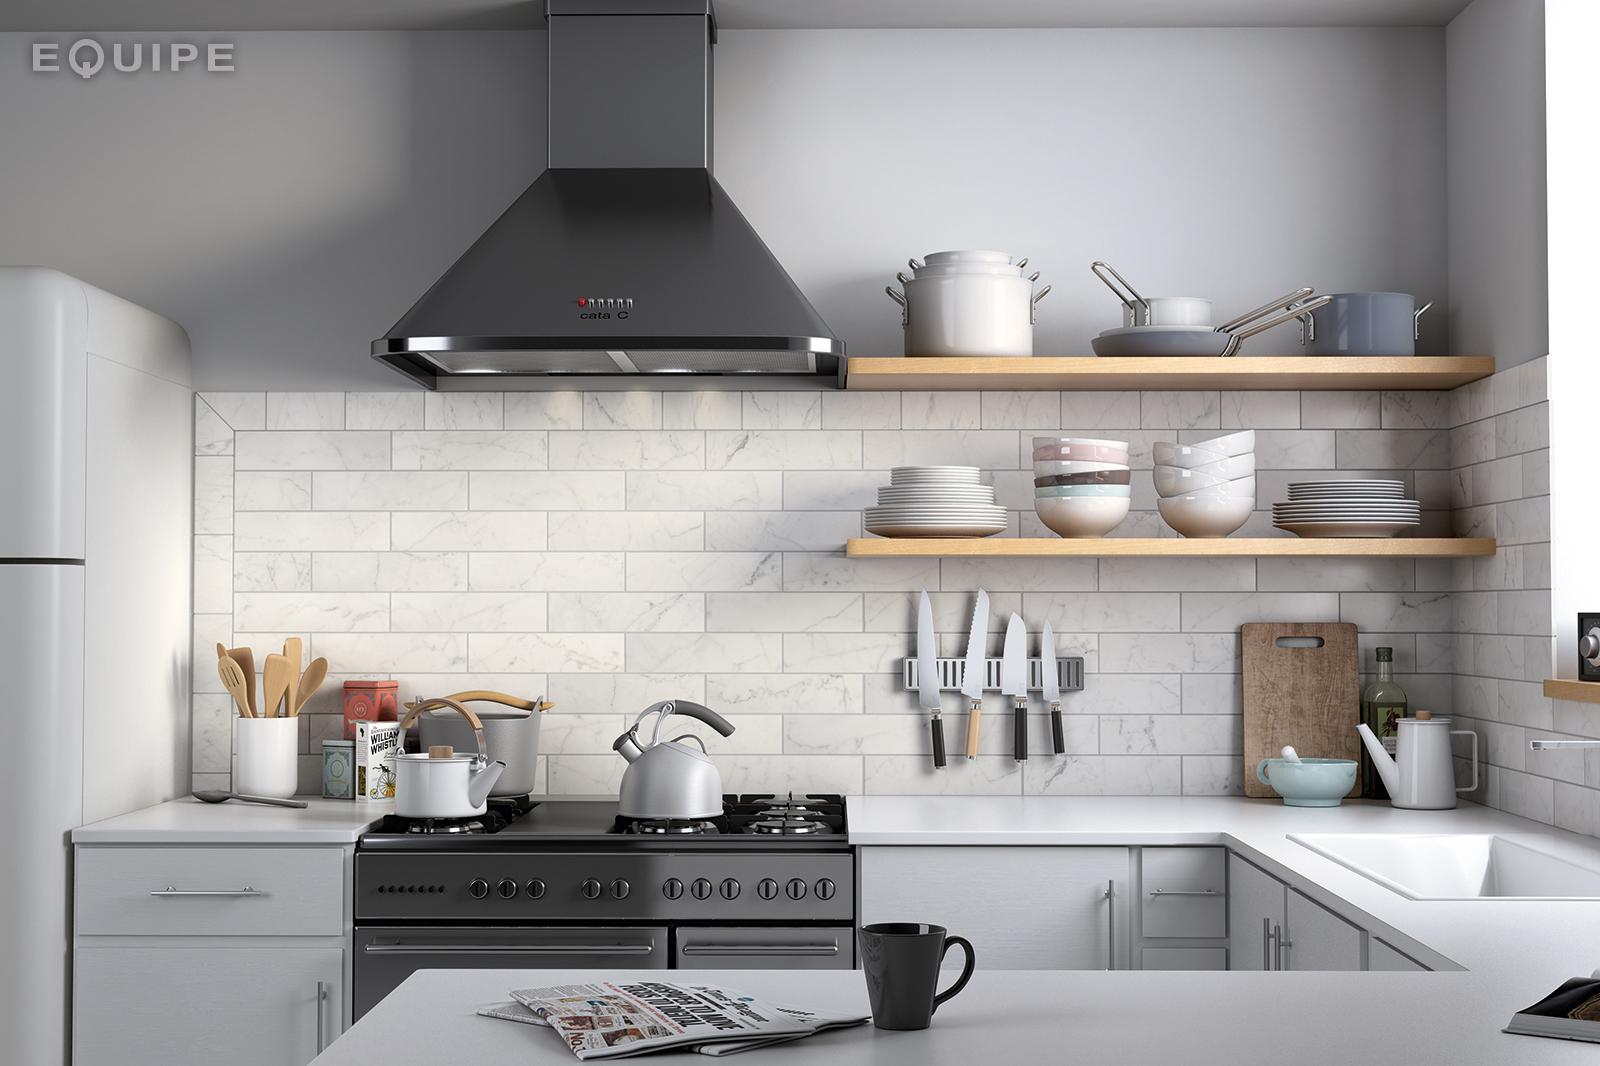 Carrara7,5x30 matt kitchen